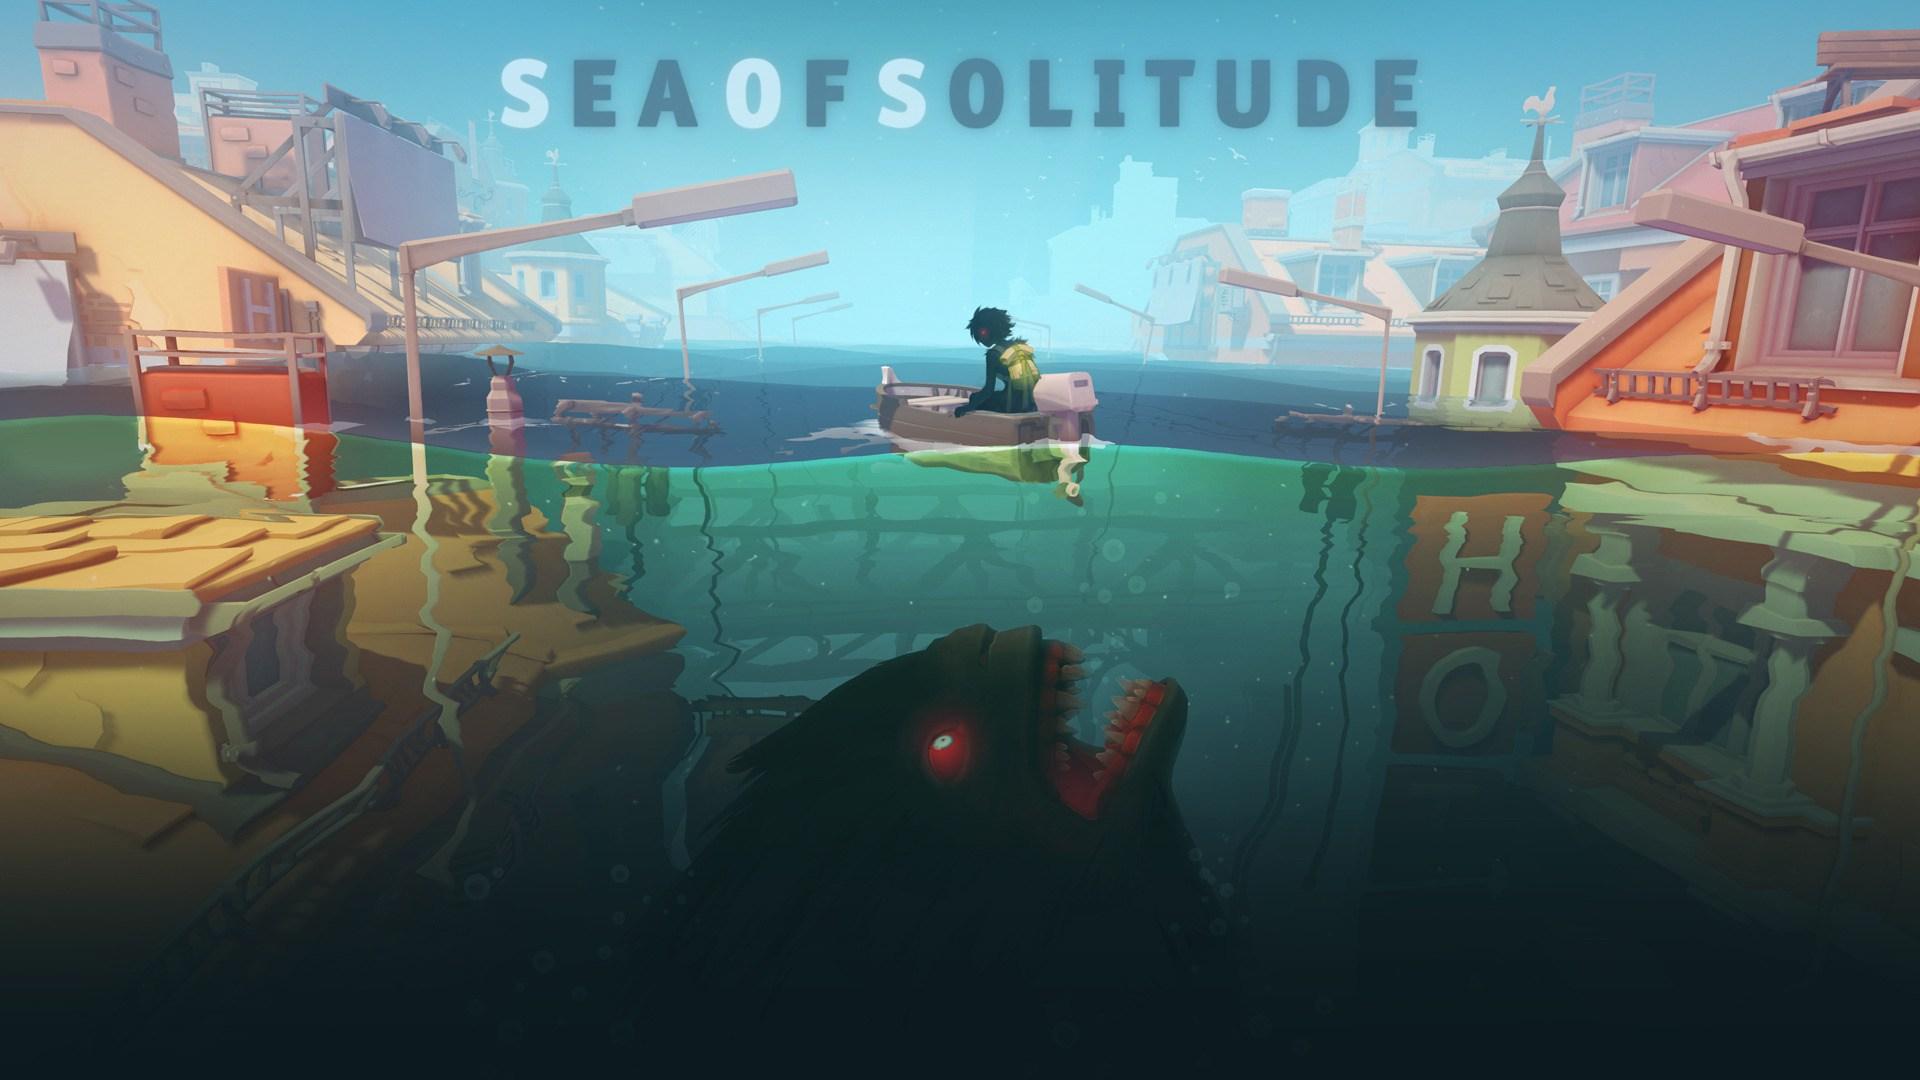 sea of solitude wallpaper 68147